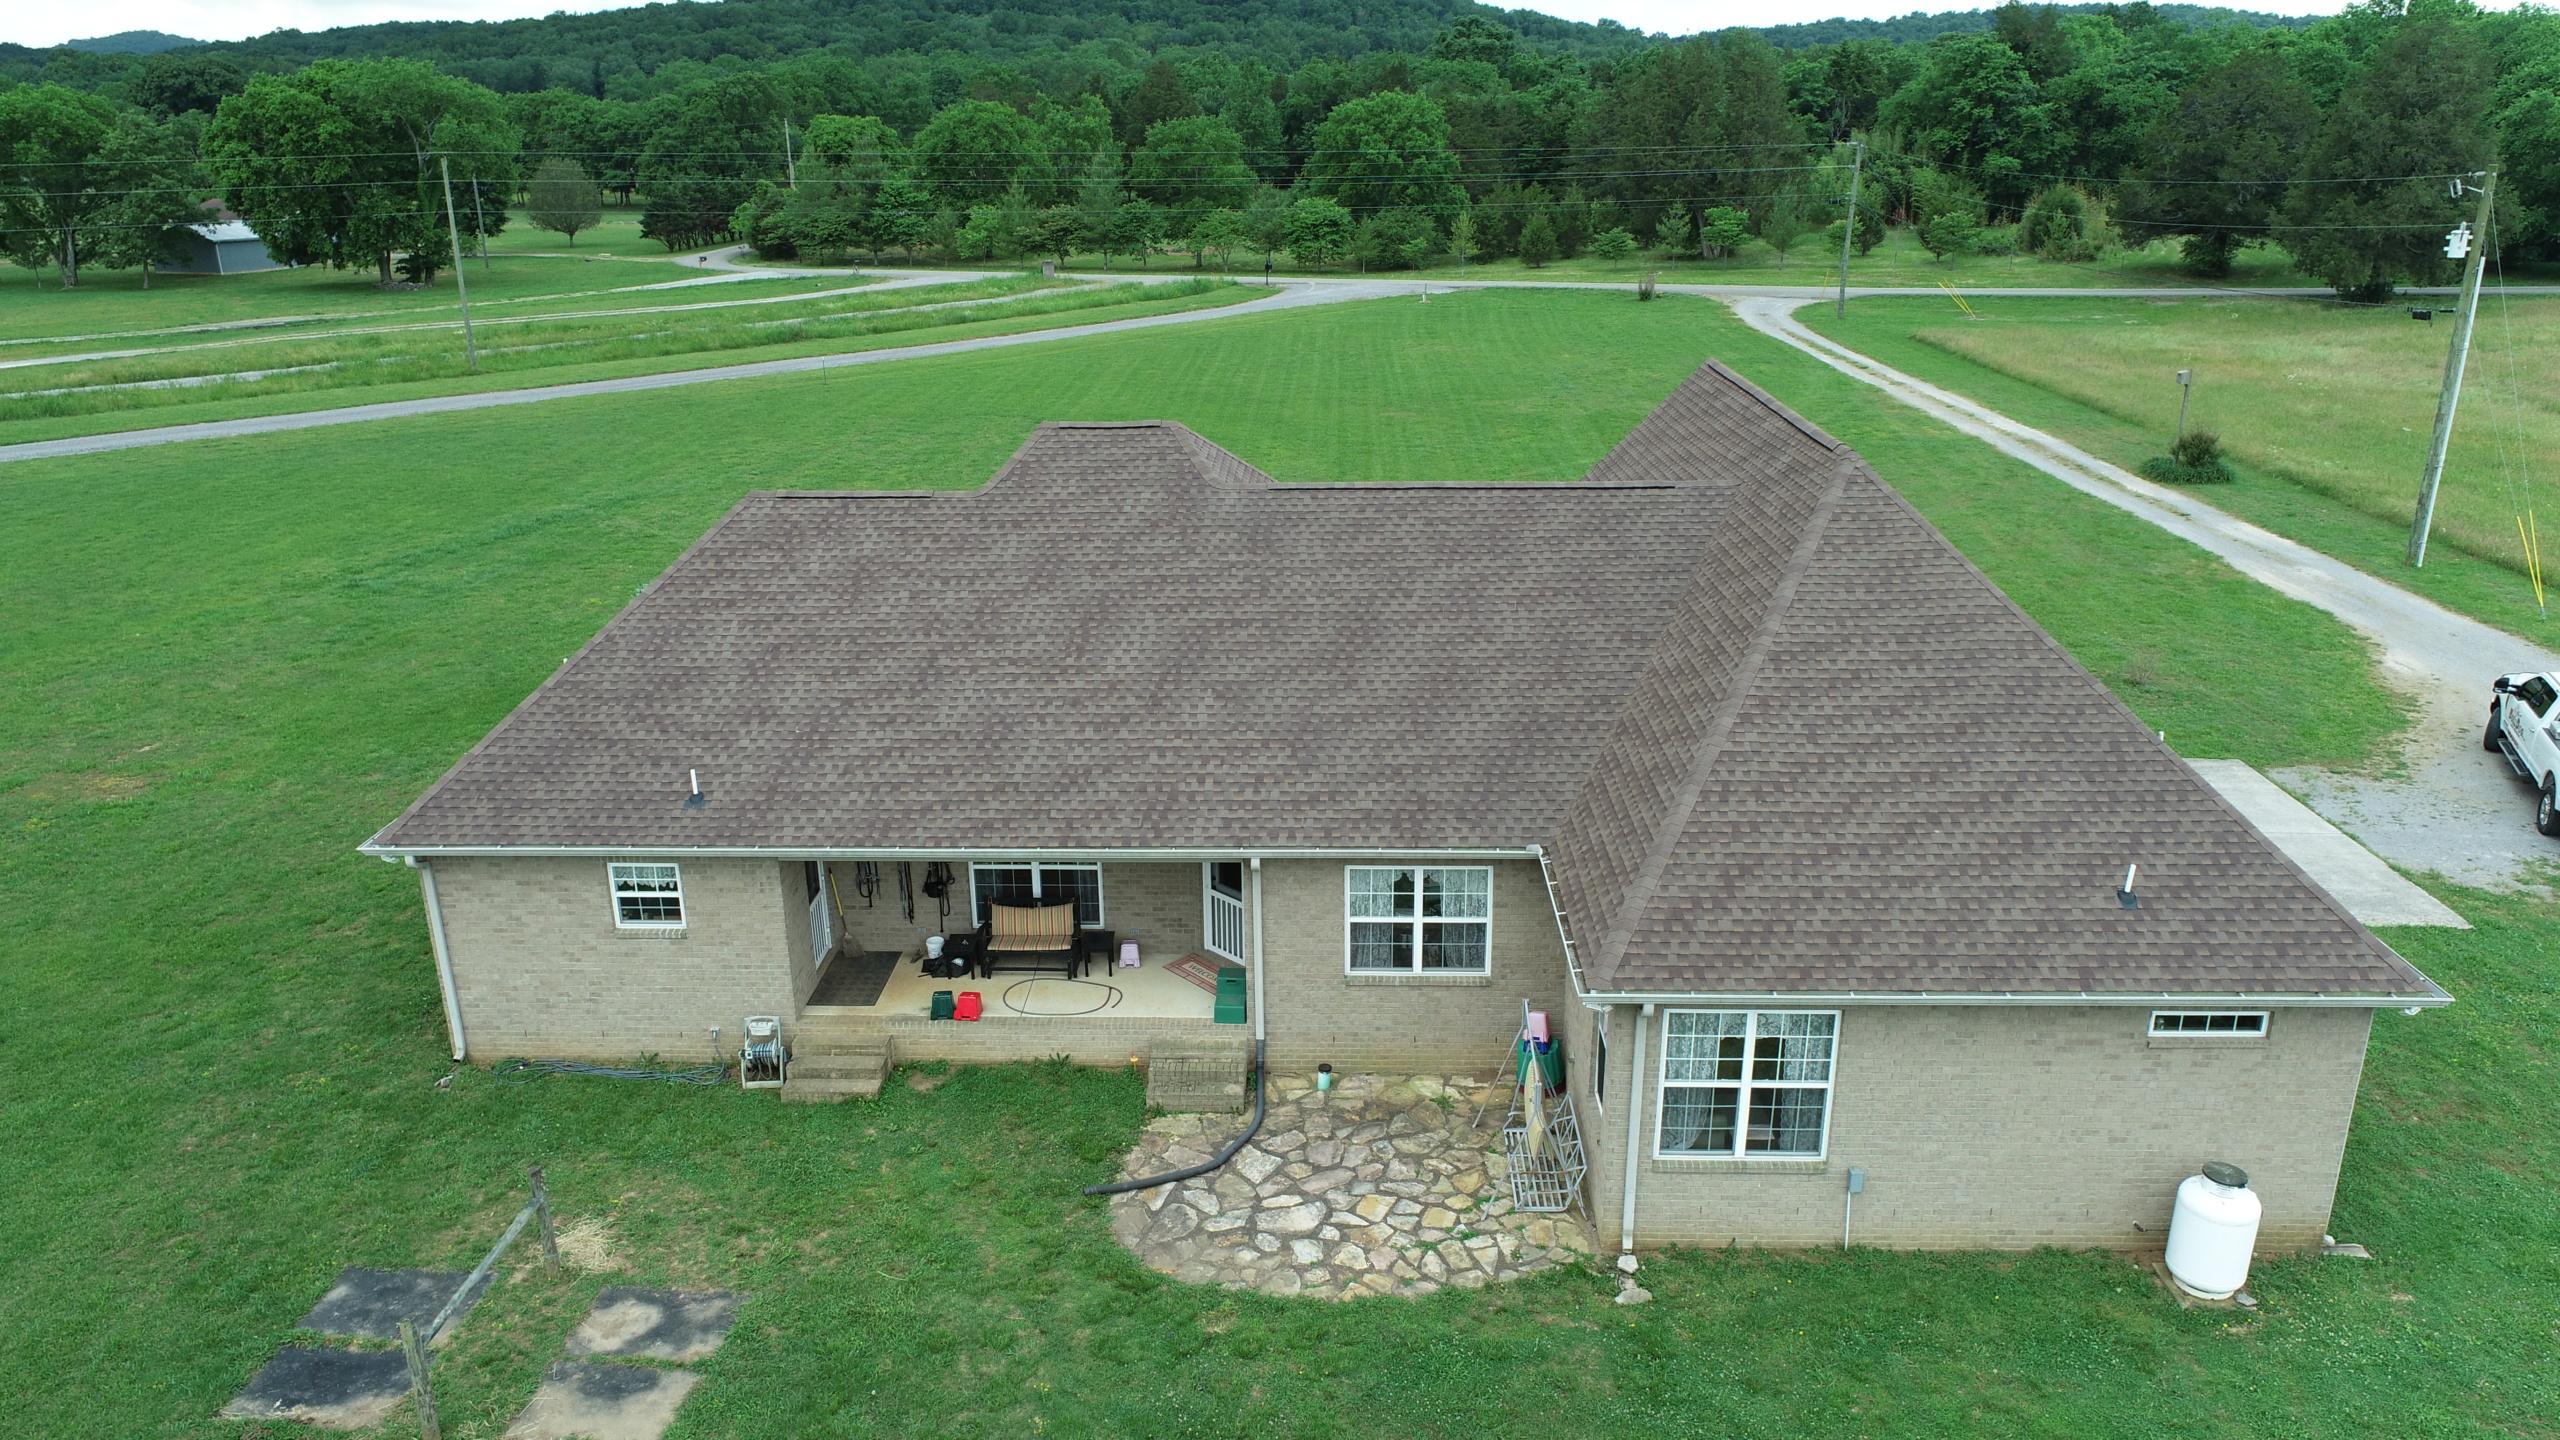 Murfreesboro Roofing Company GAF Barkwood Shingles 6